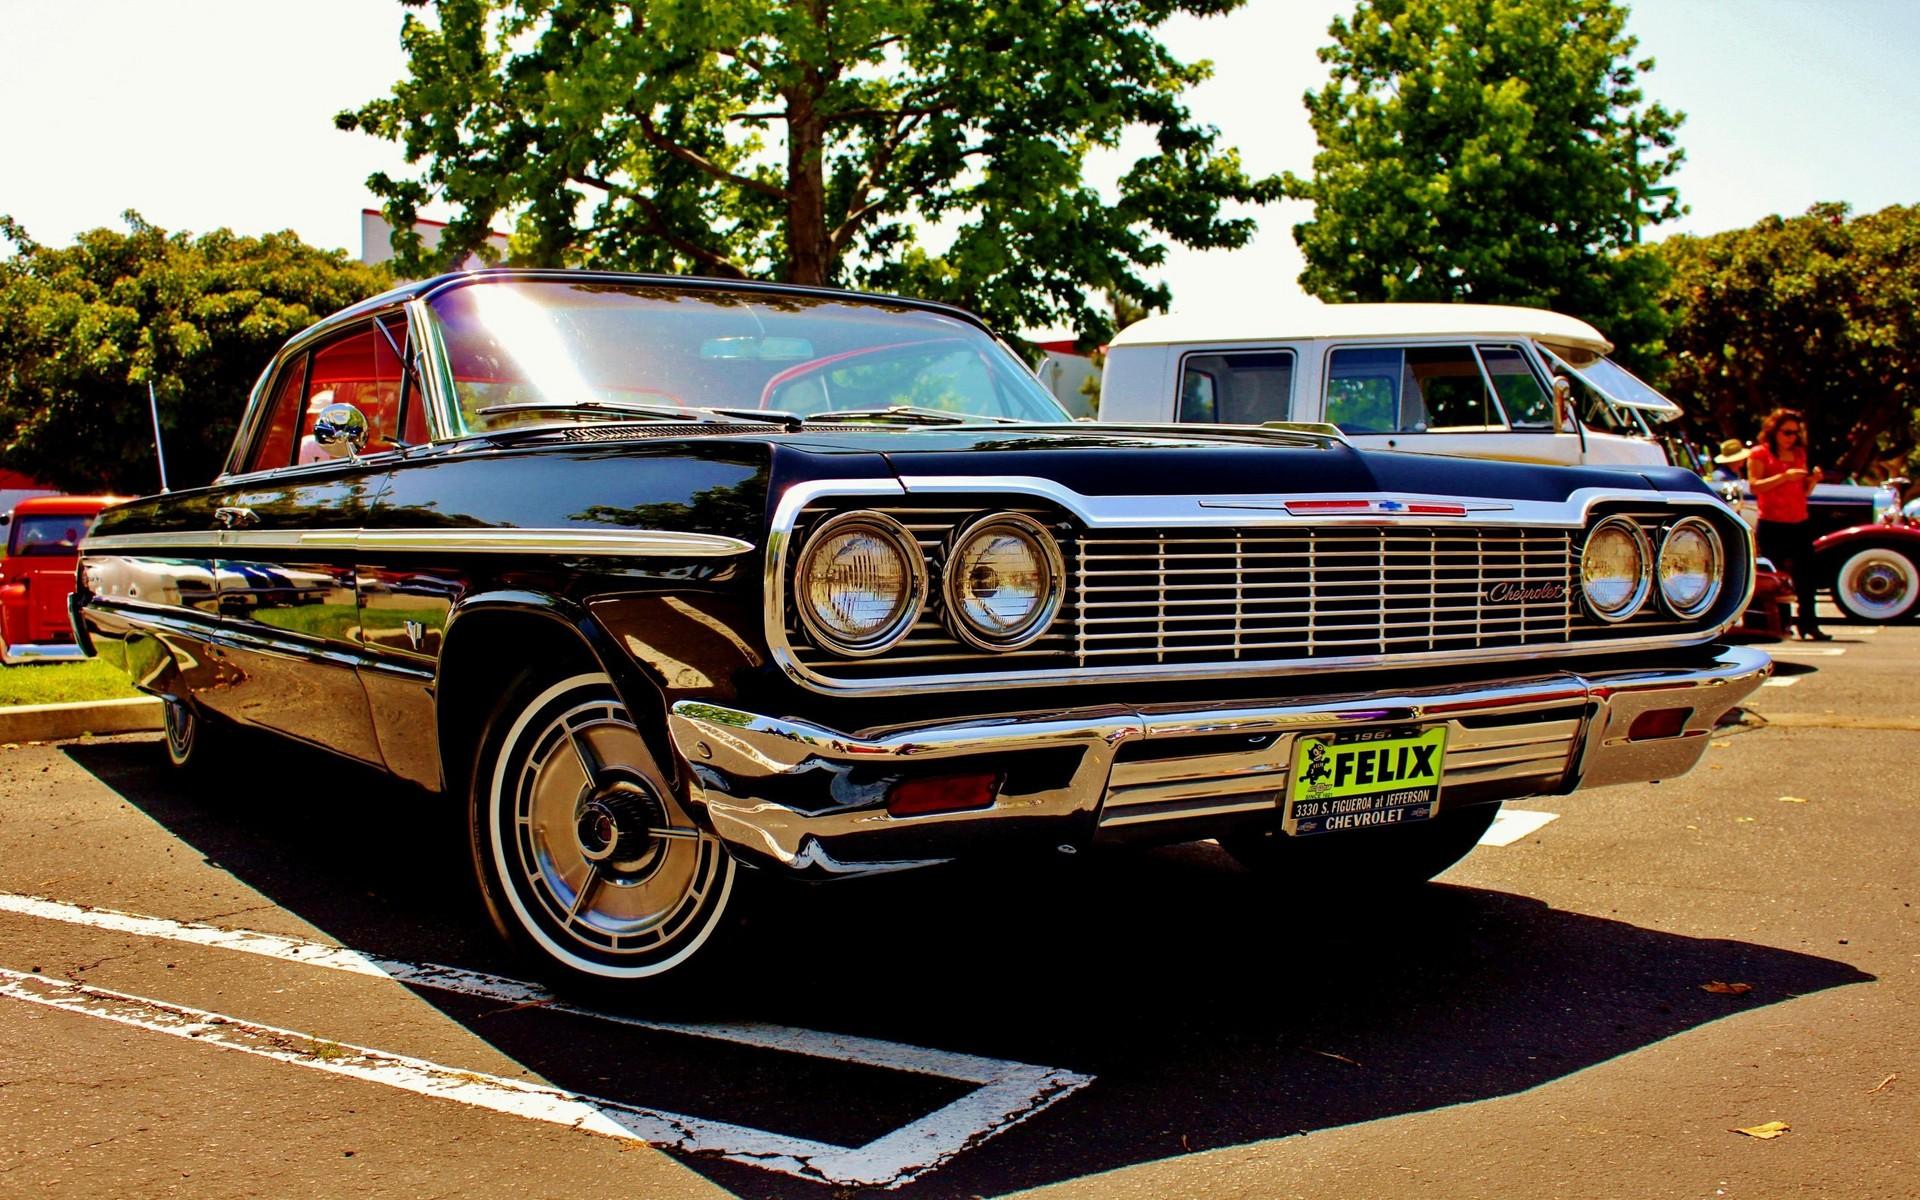 Wallpaper : old car, Oldtimer, Chevrolet Impala, Sedan, land vehicle